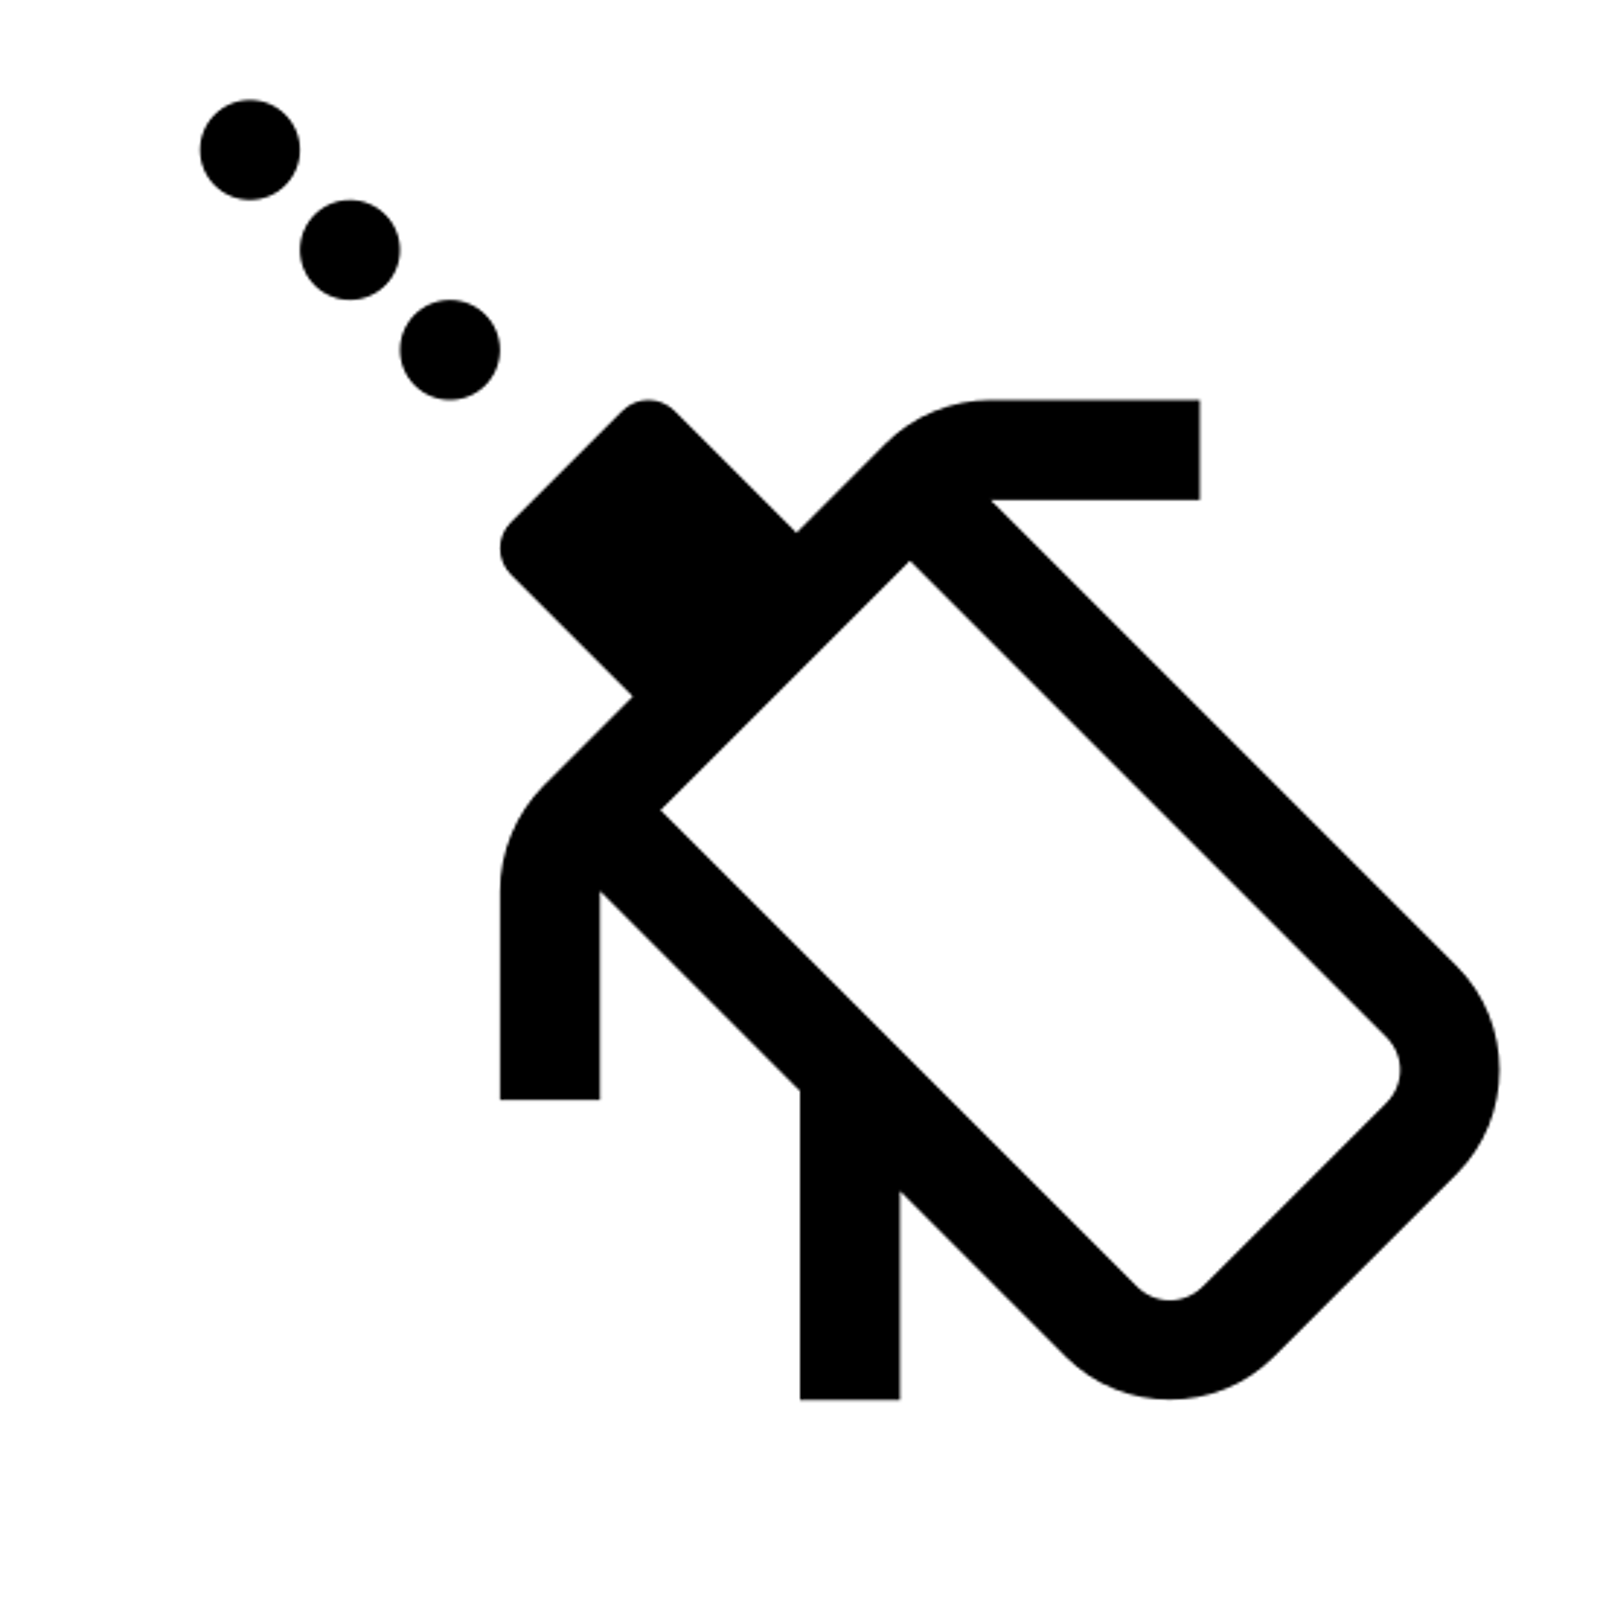 Laser Distance Meter icon